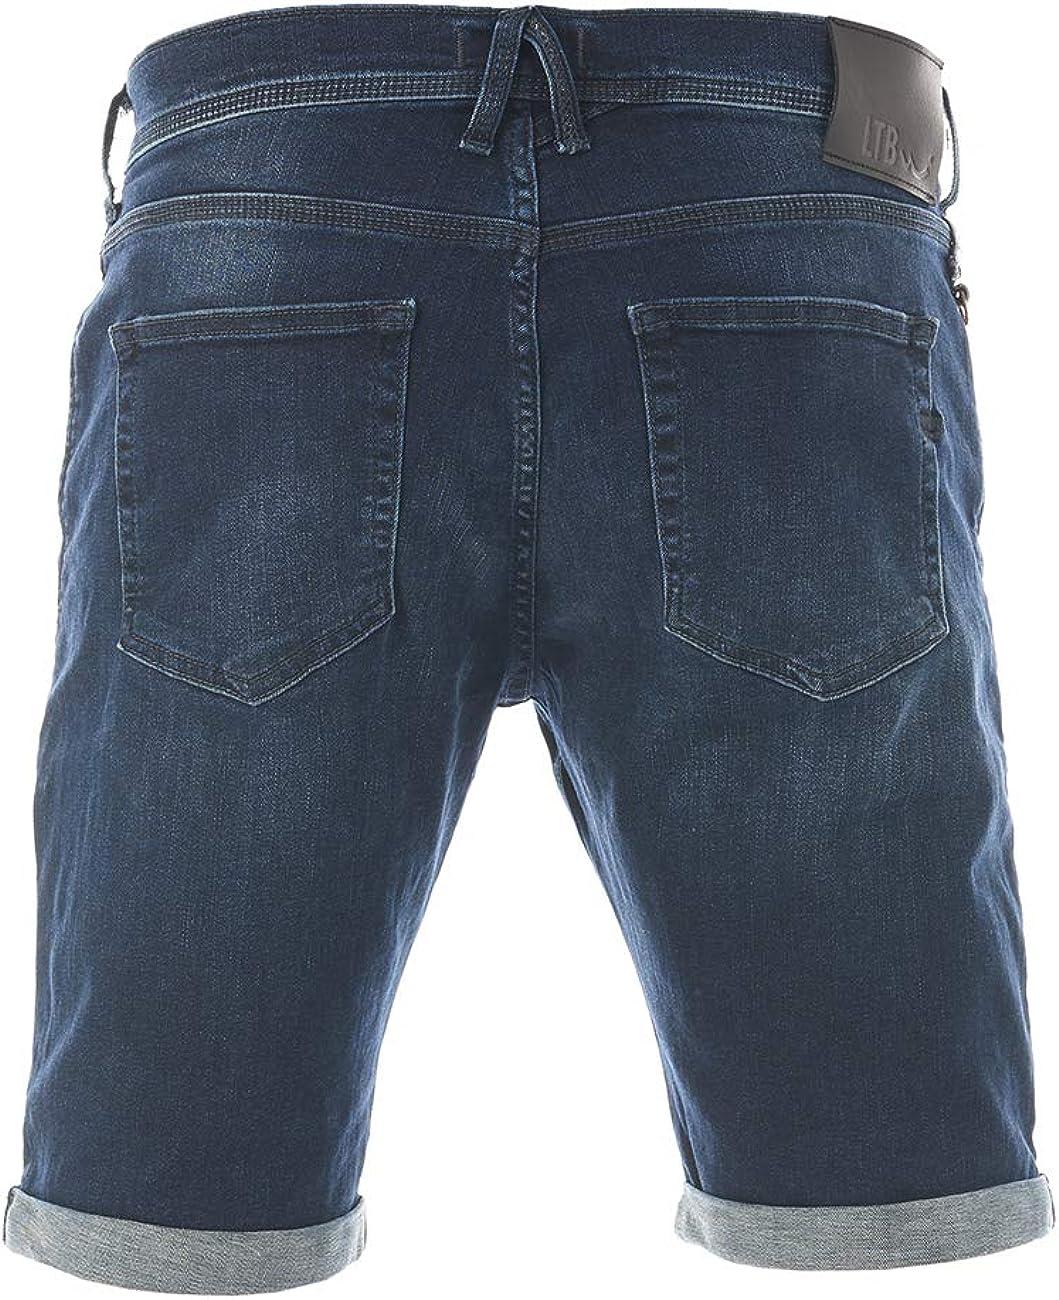 algod/ón, cortos, tallas S, M, L, XL, XXL, 3XL, 4XL, 5XL LTB Corvin Pantalones cortos para hombre color azul oscuro y negro